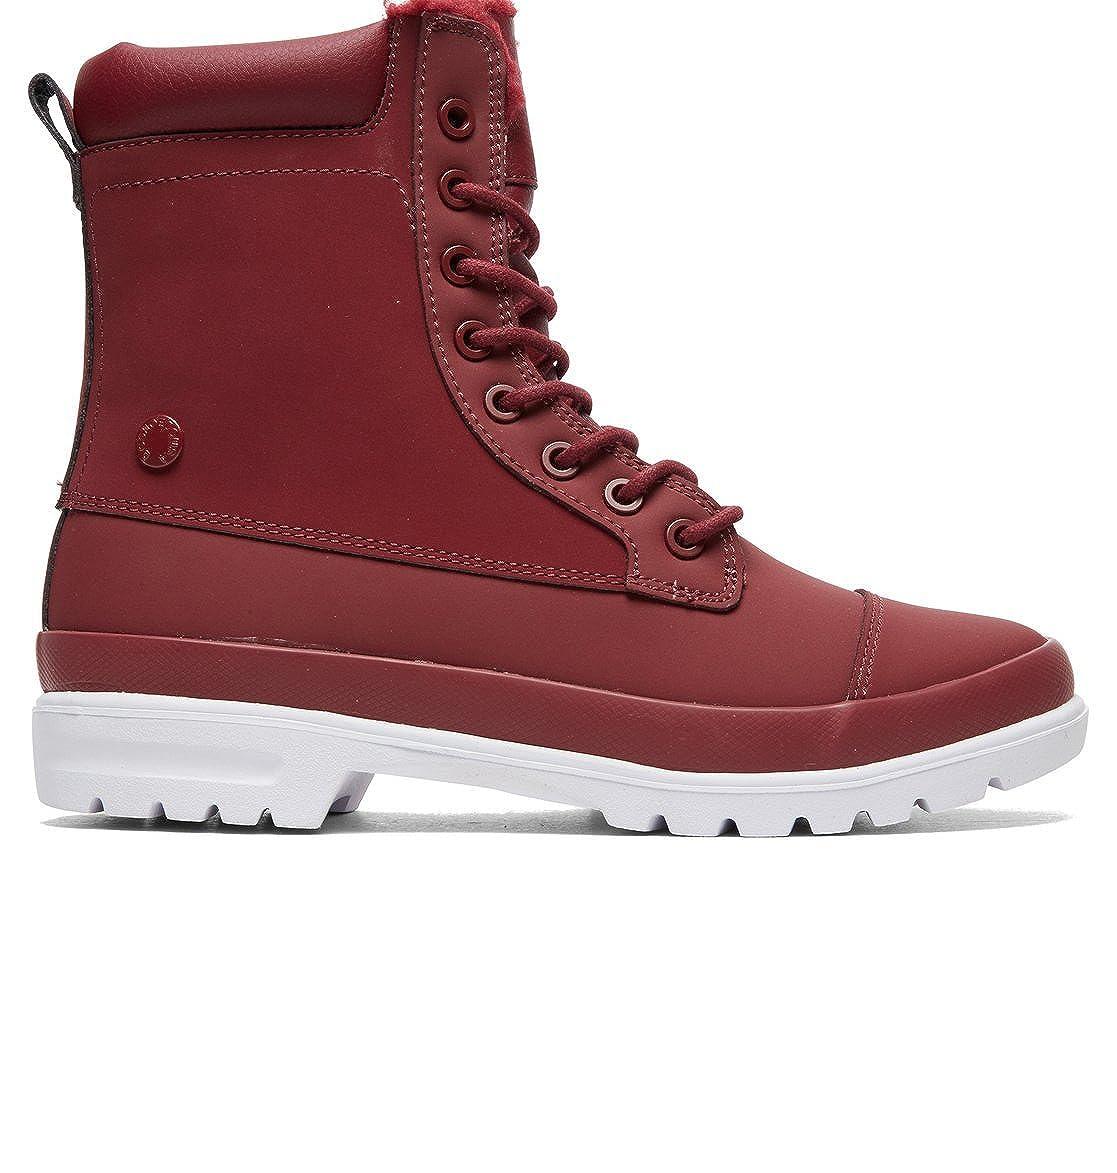 DC Shoes Damen Amnesti Wnt Stiefel